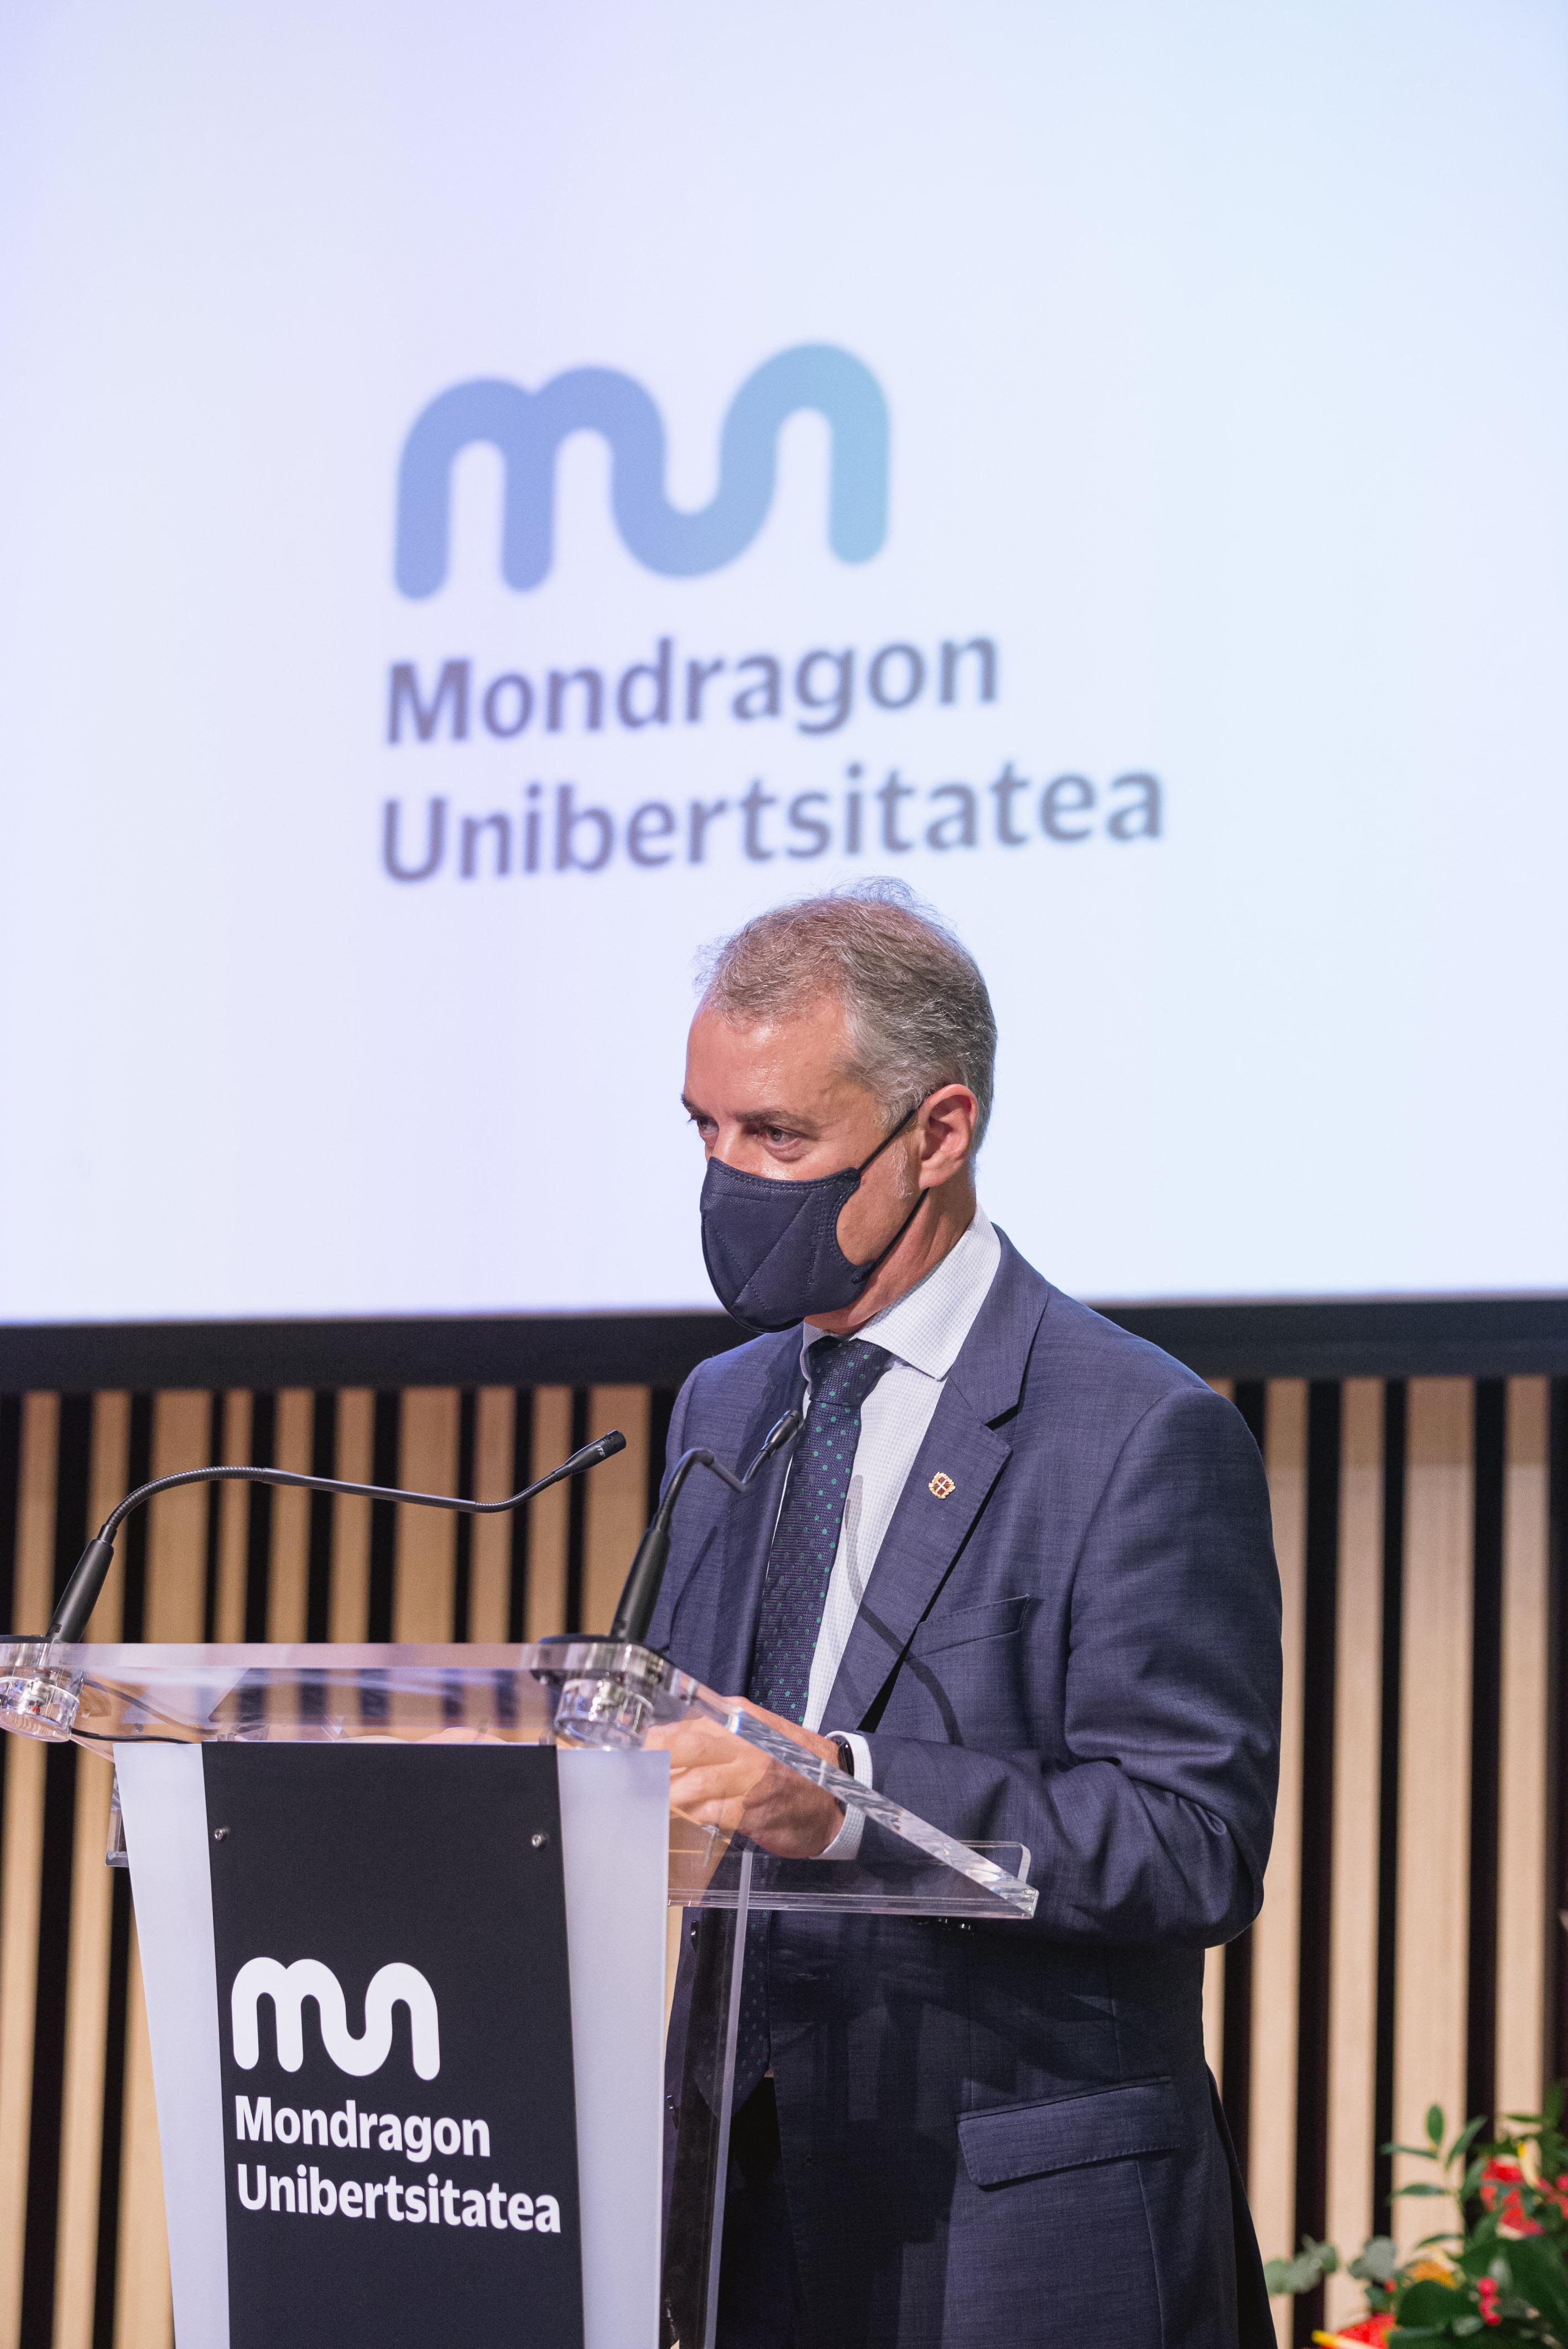 Mondragon_uni_donostia17-9-2021_usual-9829.jpg